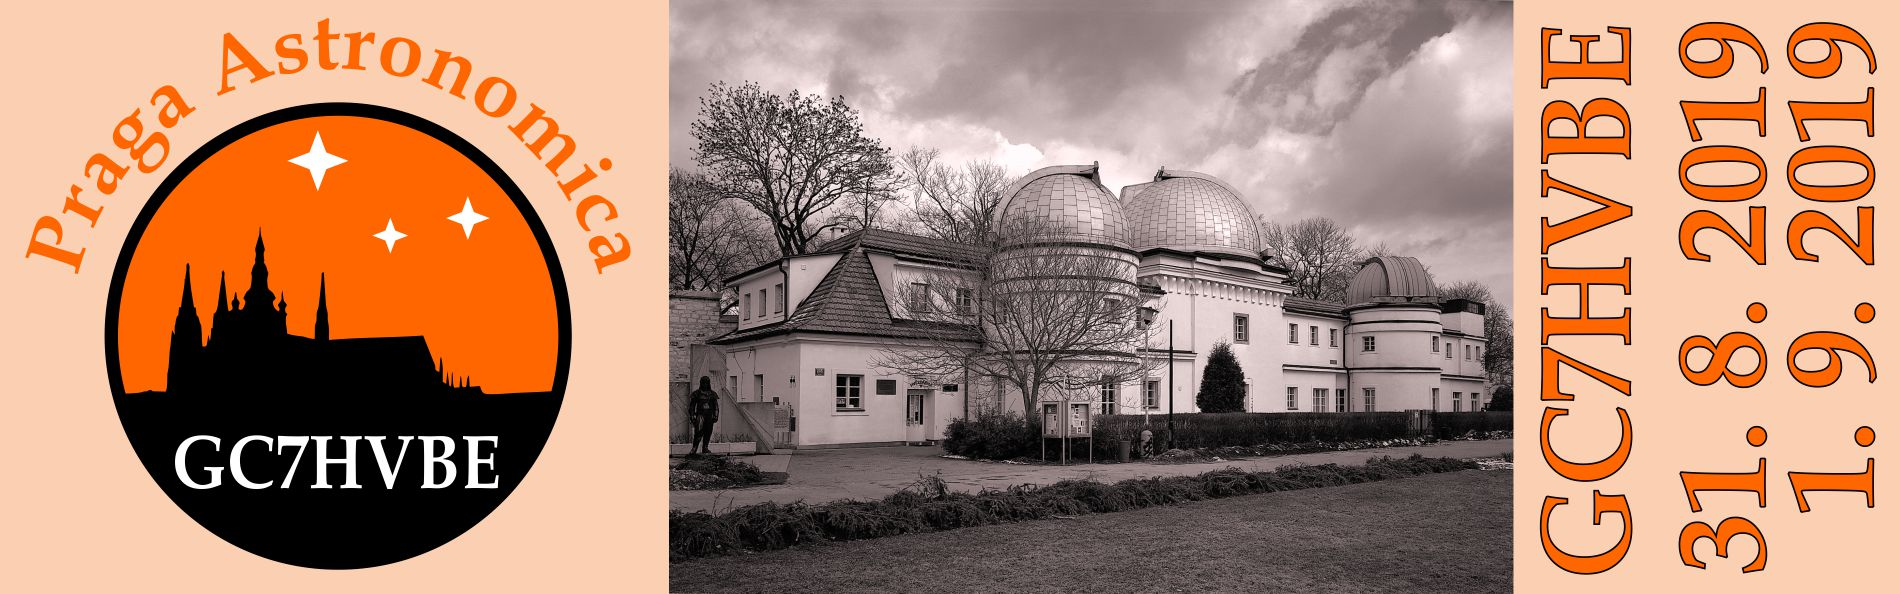 NEWS Praga Astronomica (03) - Brahe a jeho přístroje